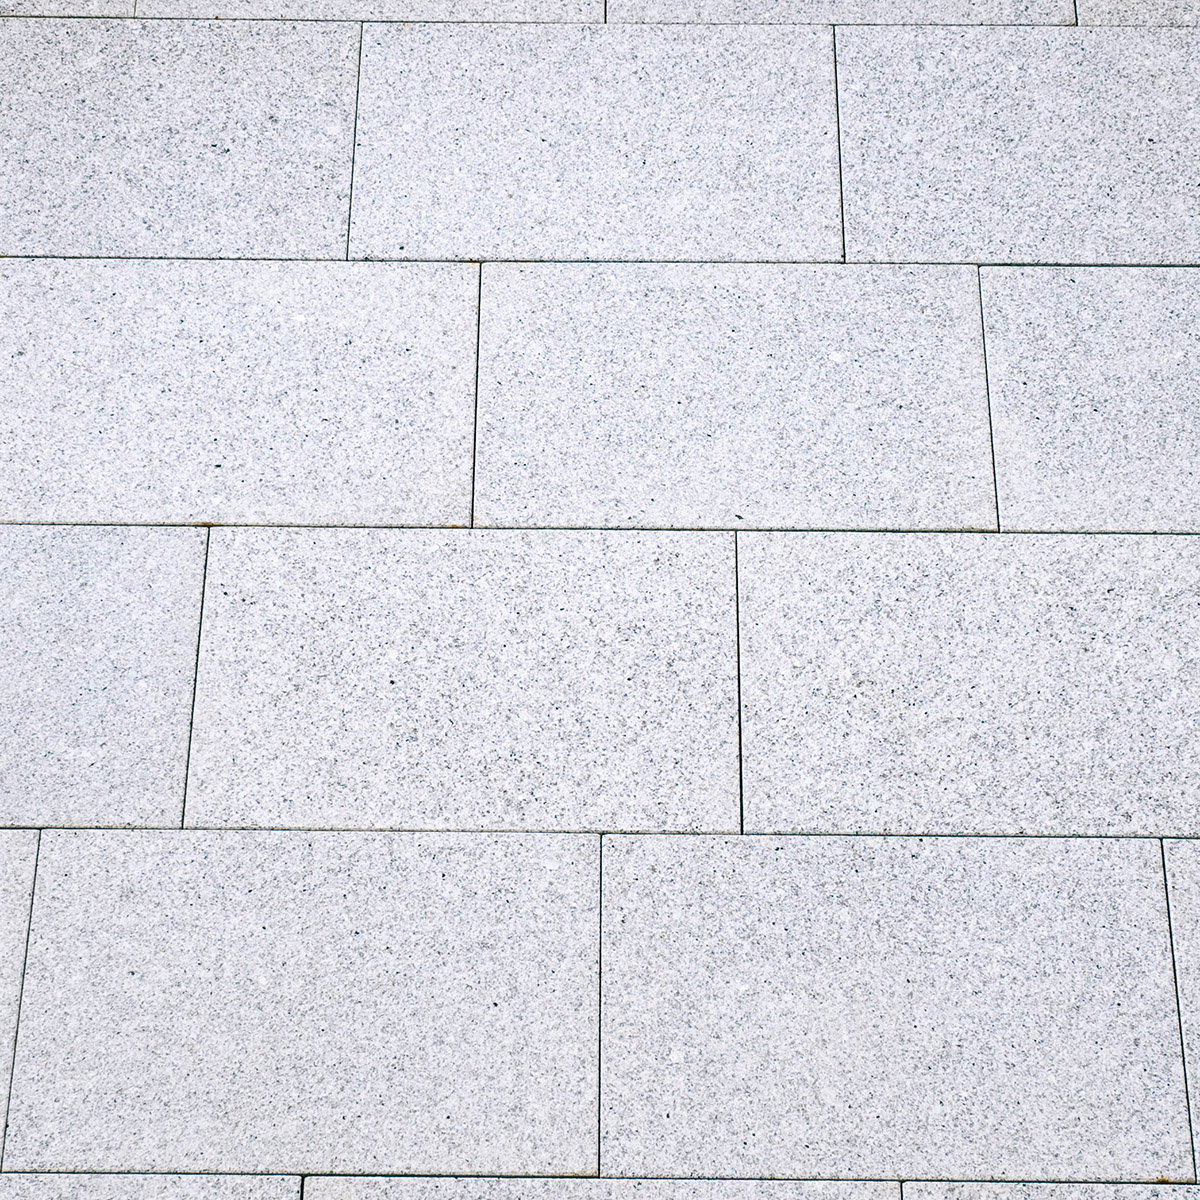 terrassenplatten granit hellgrau geflammt geb rstet. Black Bedroom Furniture Sets. Home Design Ideas